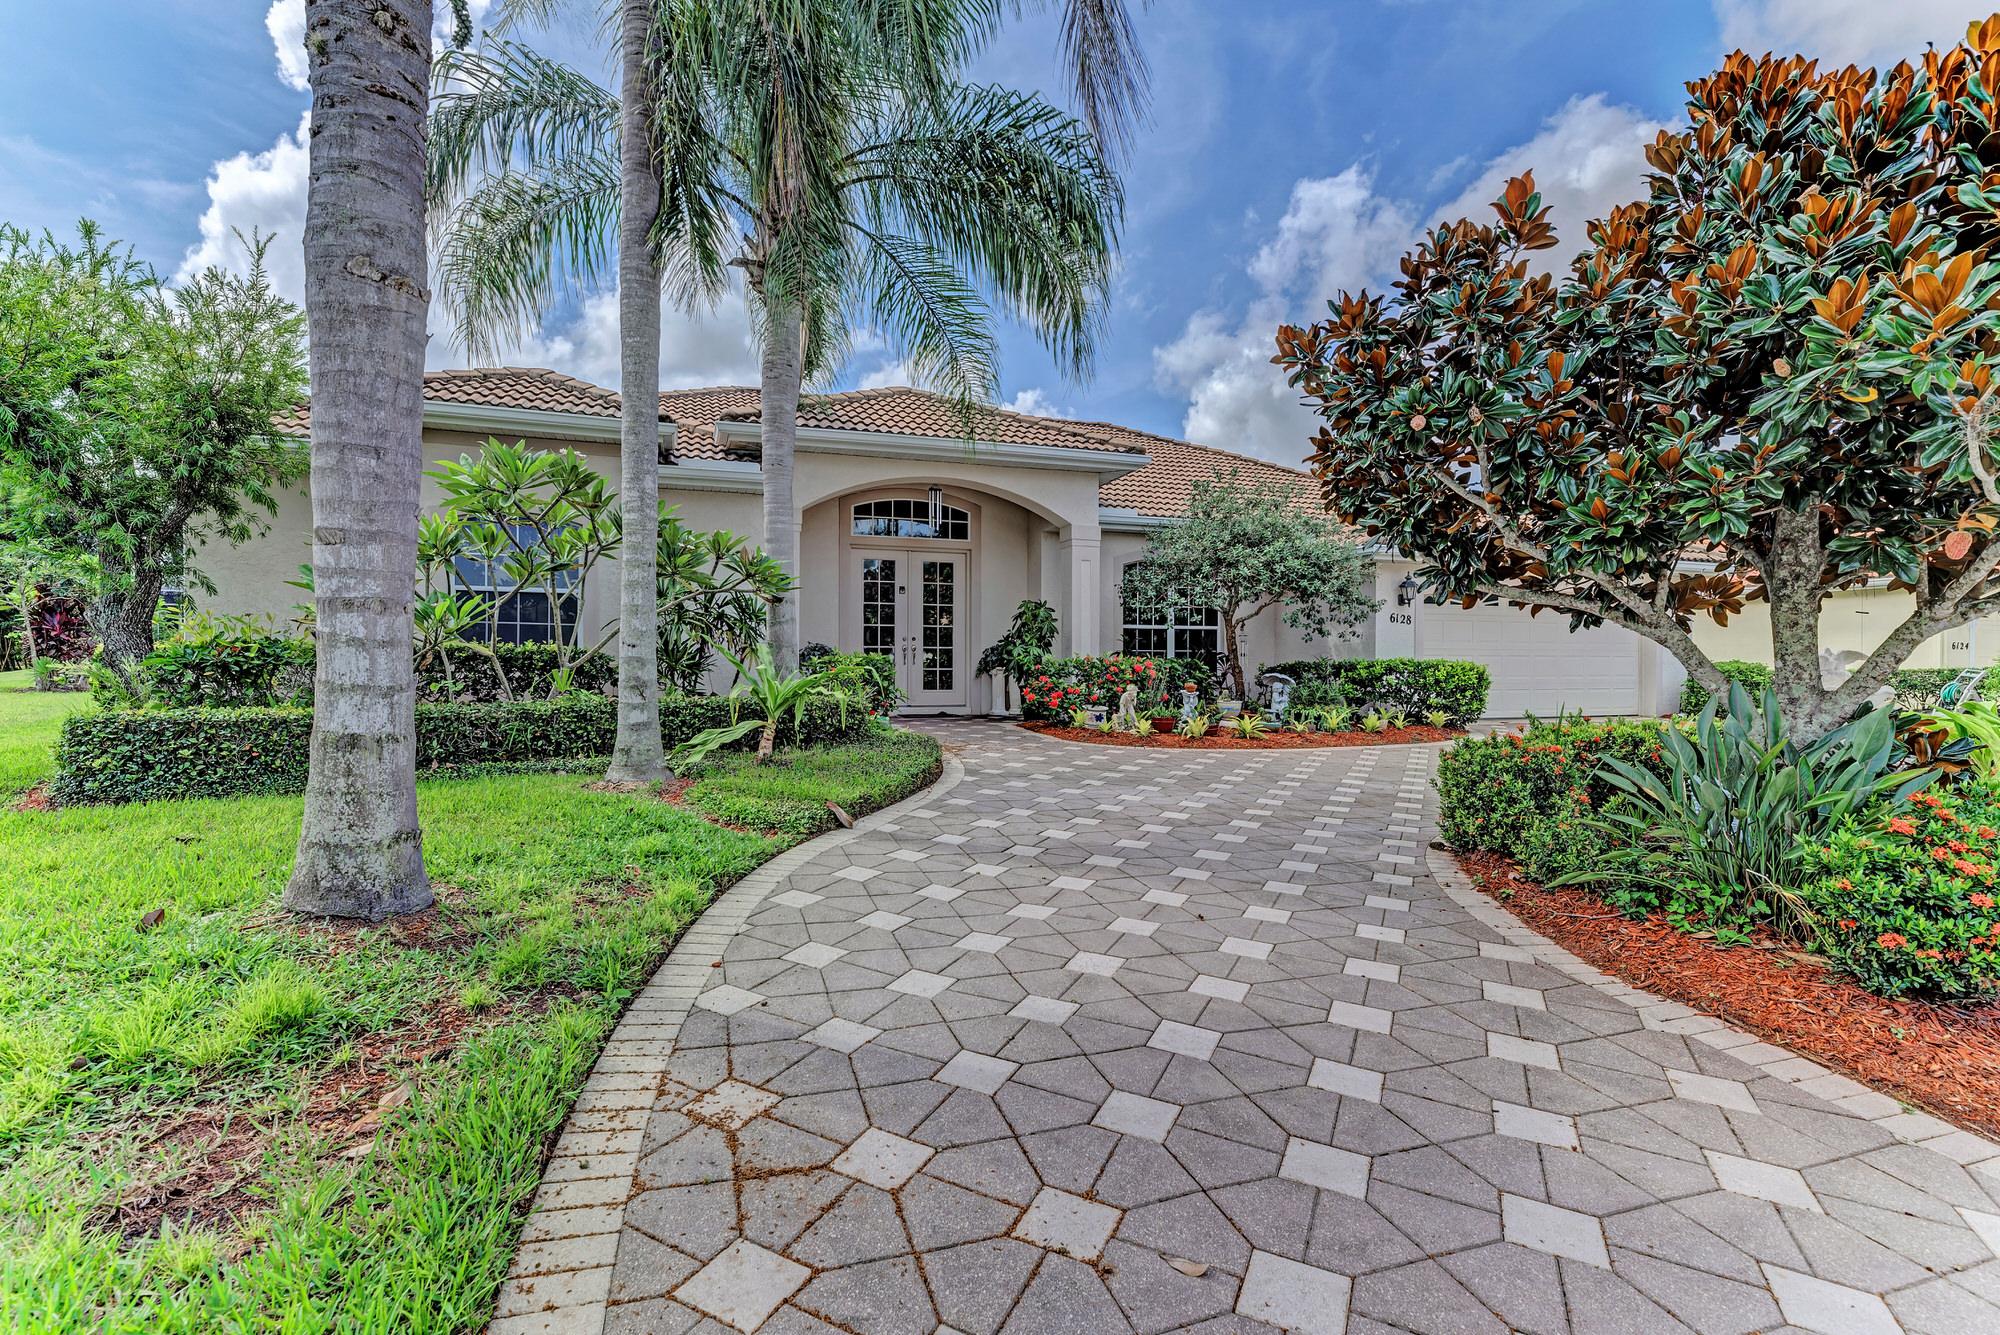 Real Estate 6128 STILLWATER CT, UNIVERSITY PARK, FL 34201